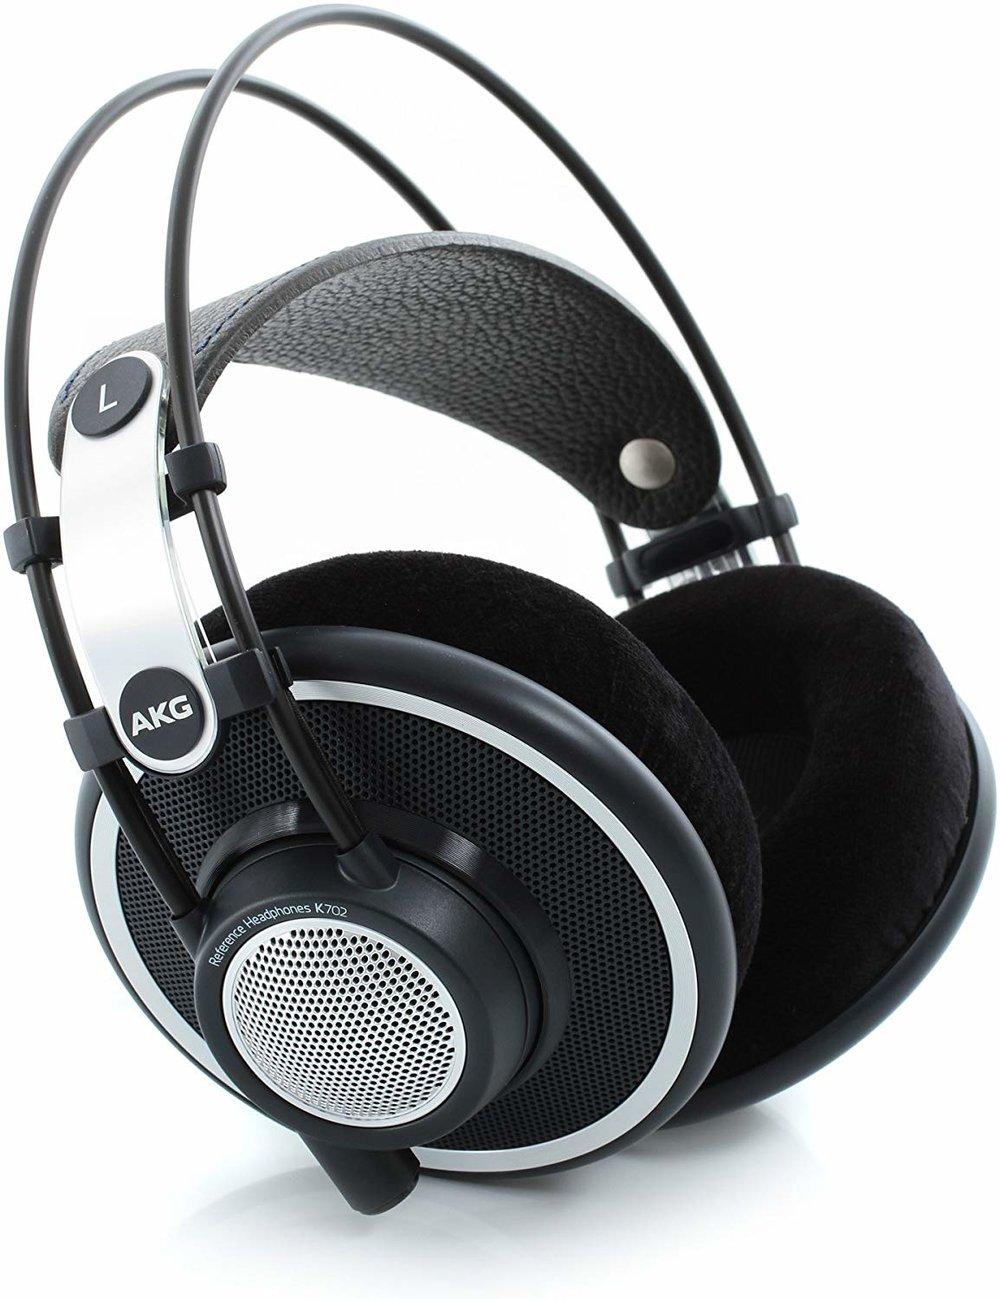 AKG K702 Pro Audio Professional Headphones - $236.99 - $112.01 off or 32%